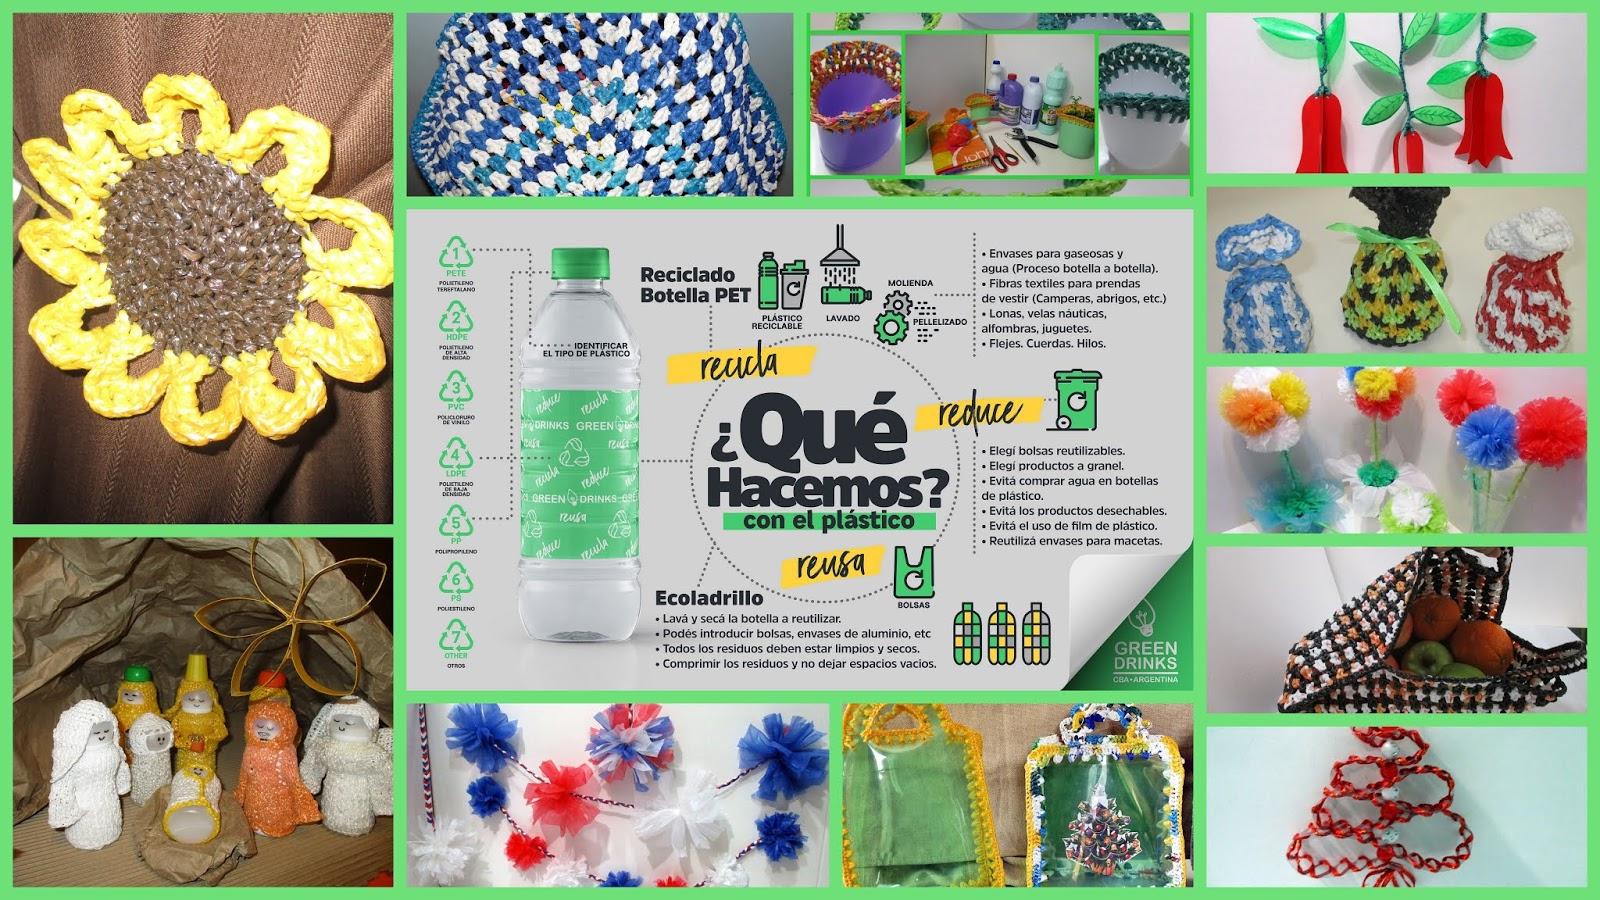 1 2 3 Creamos Otra Vez Ideas Para Reutilizar Plasticos Manualidades - Manualidades-creativas